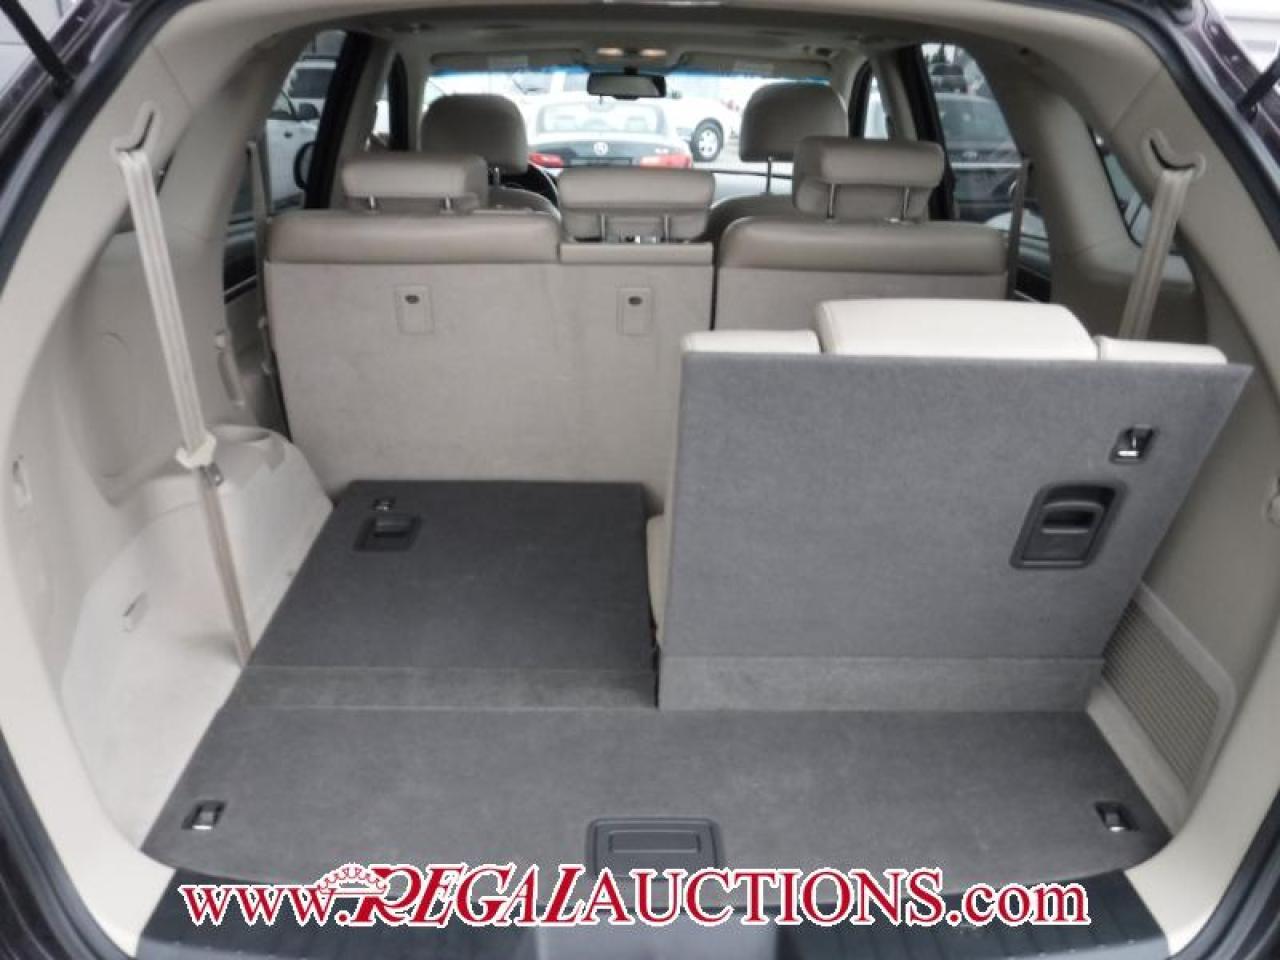 2010 Hyundai VERACRUZ AWD LIMITED